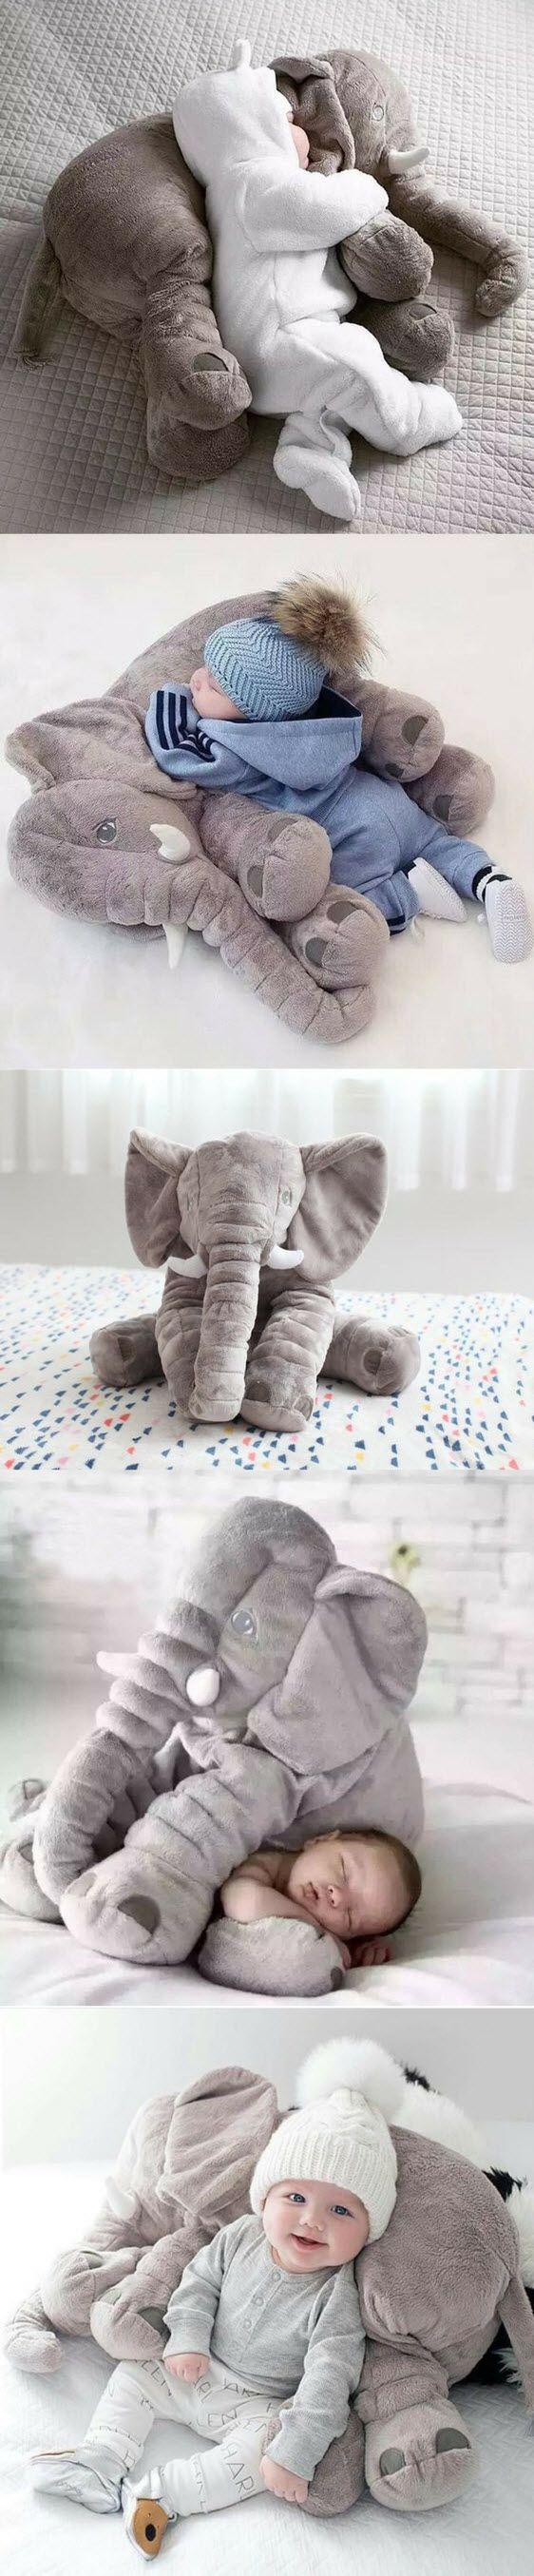 Fox and the elephant